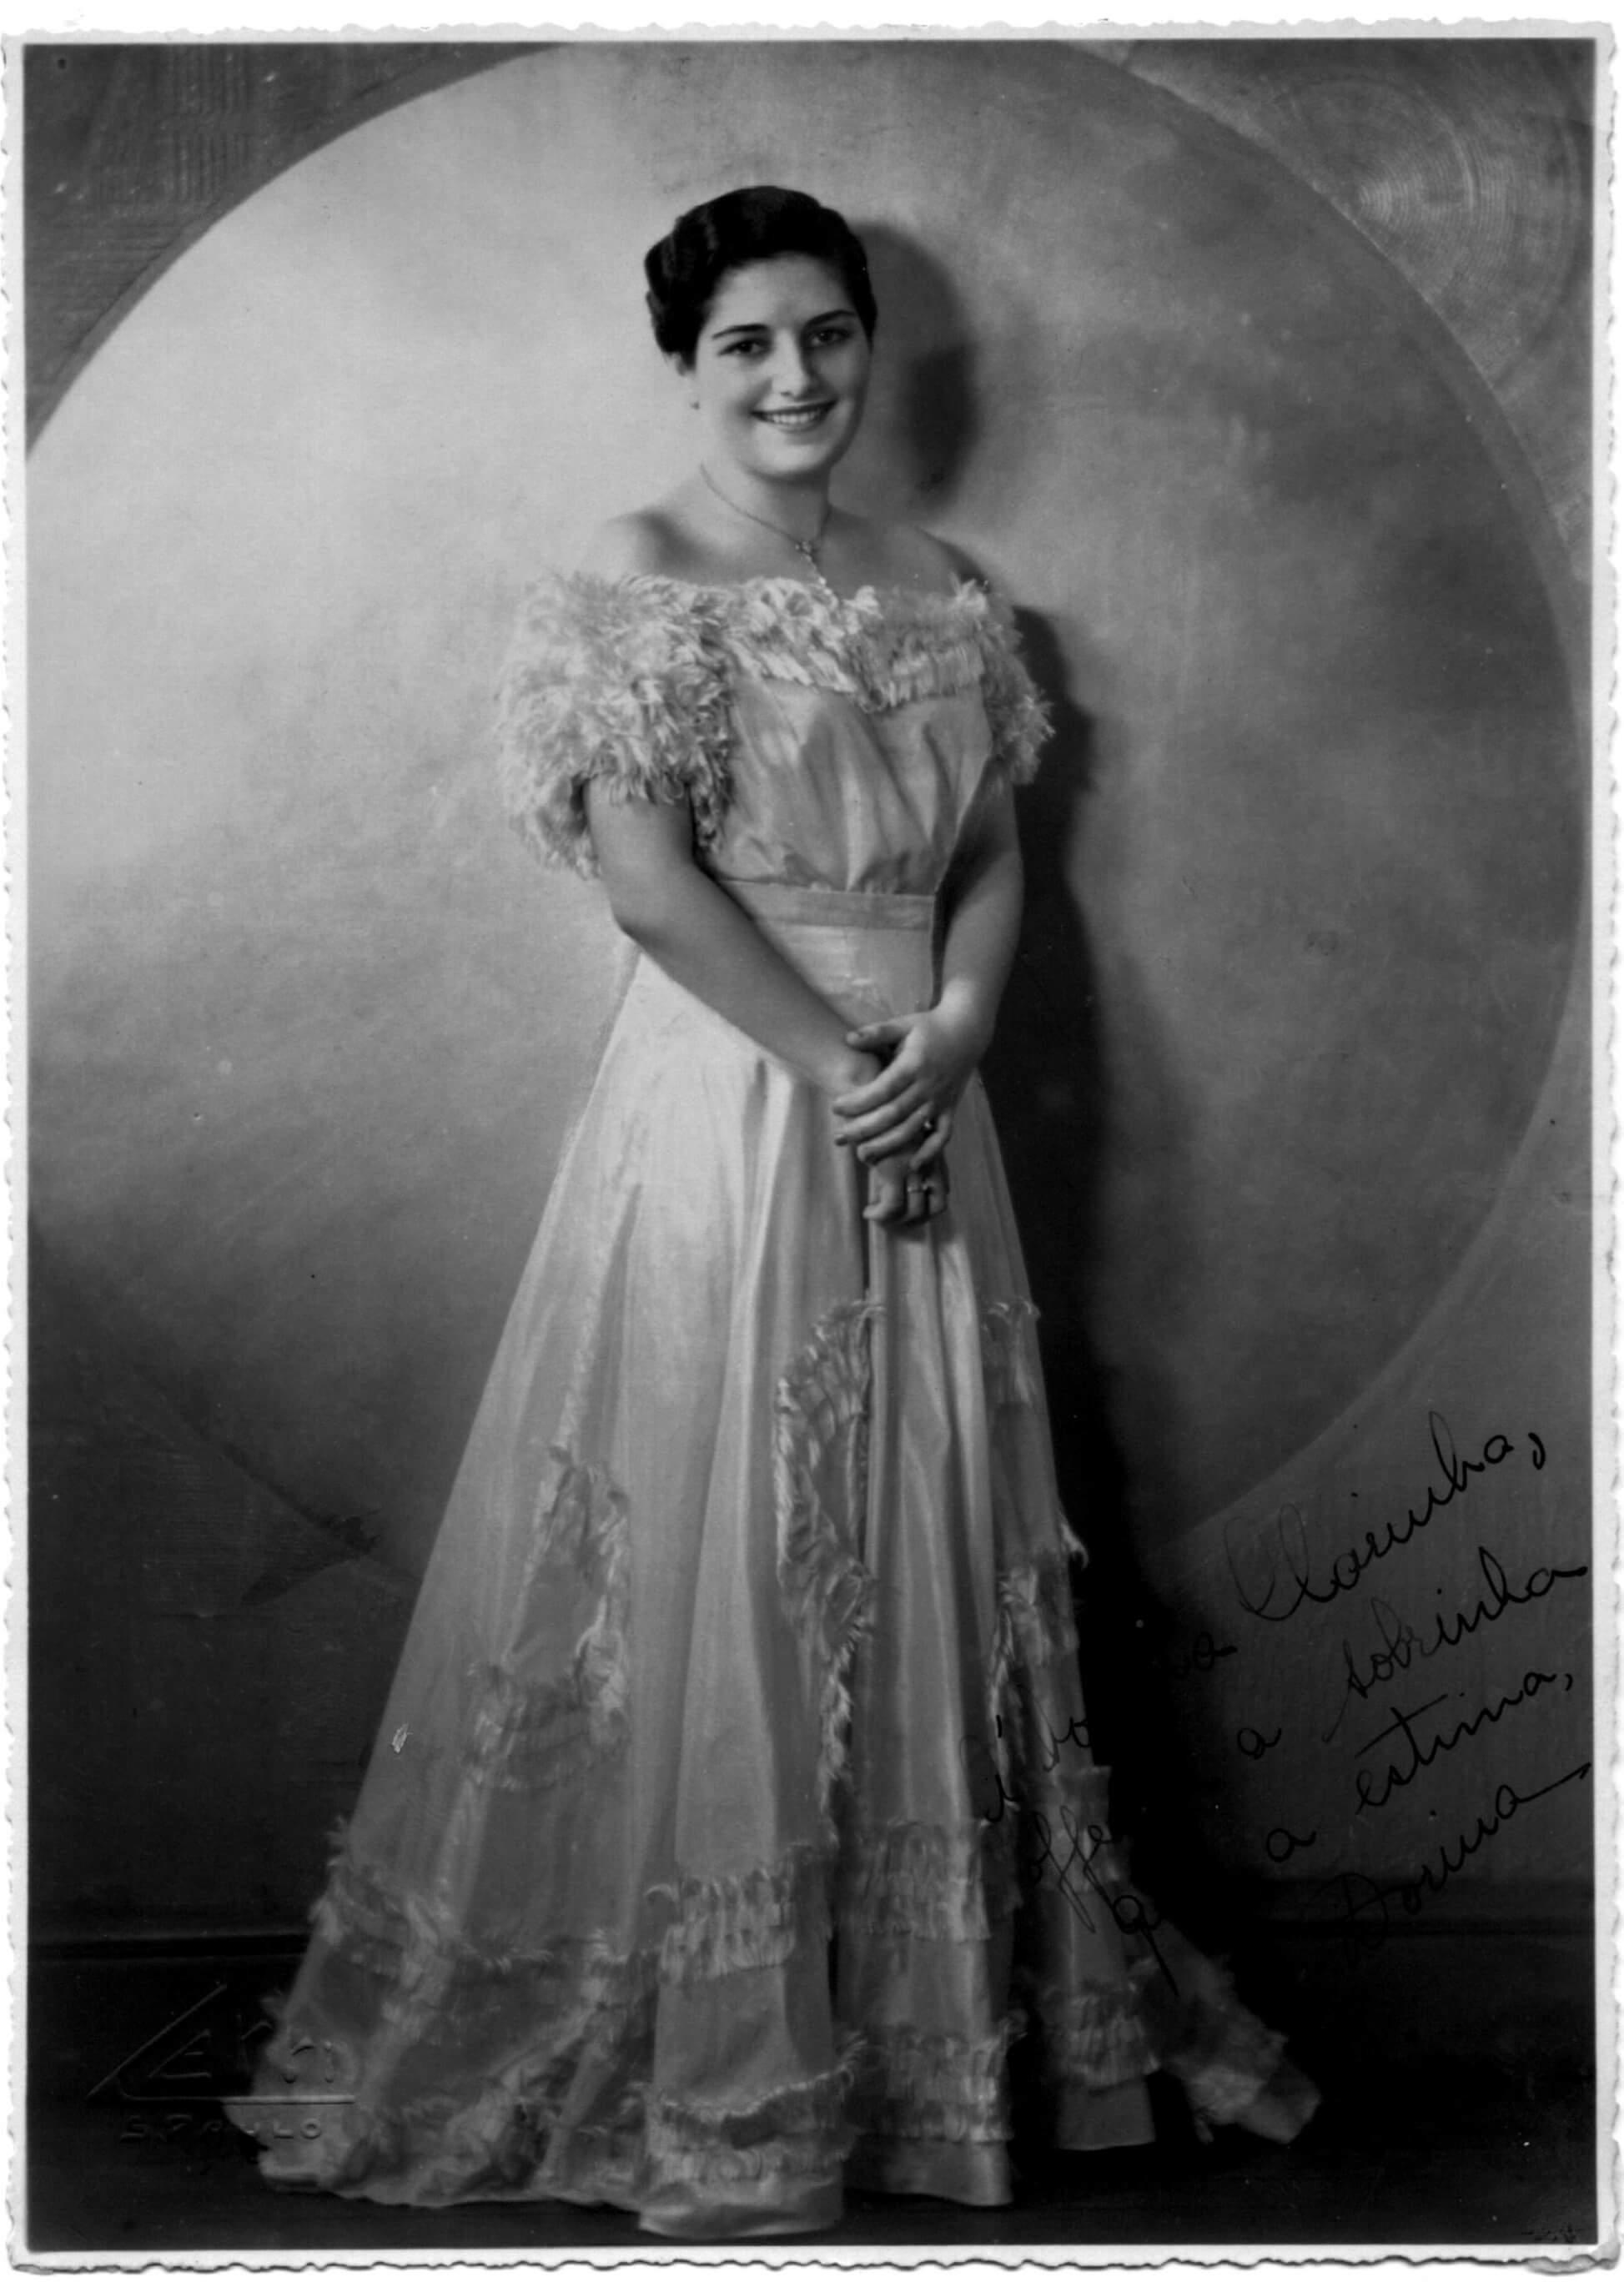 Foto em preto e branco de Dorina sorrindo, de vestido branco.